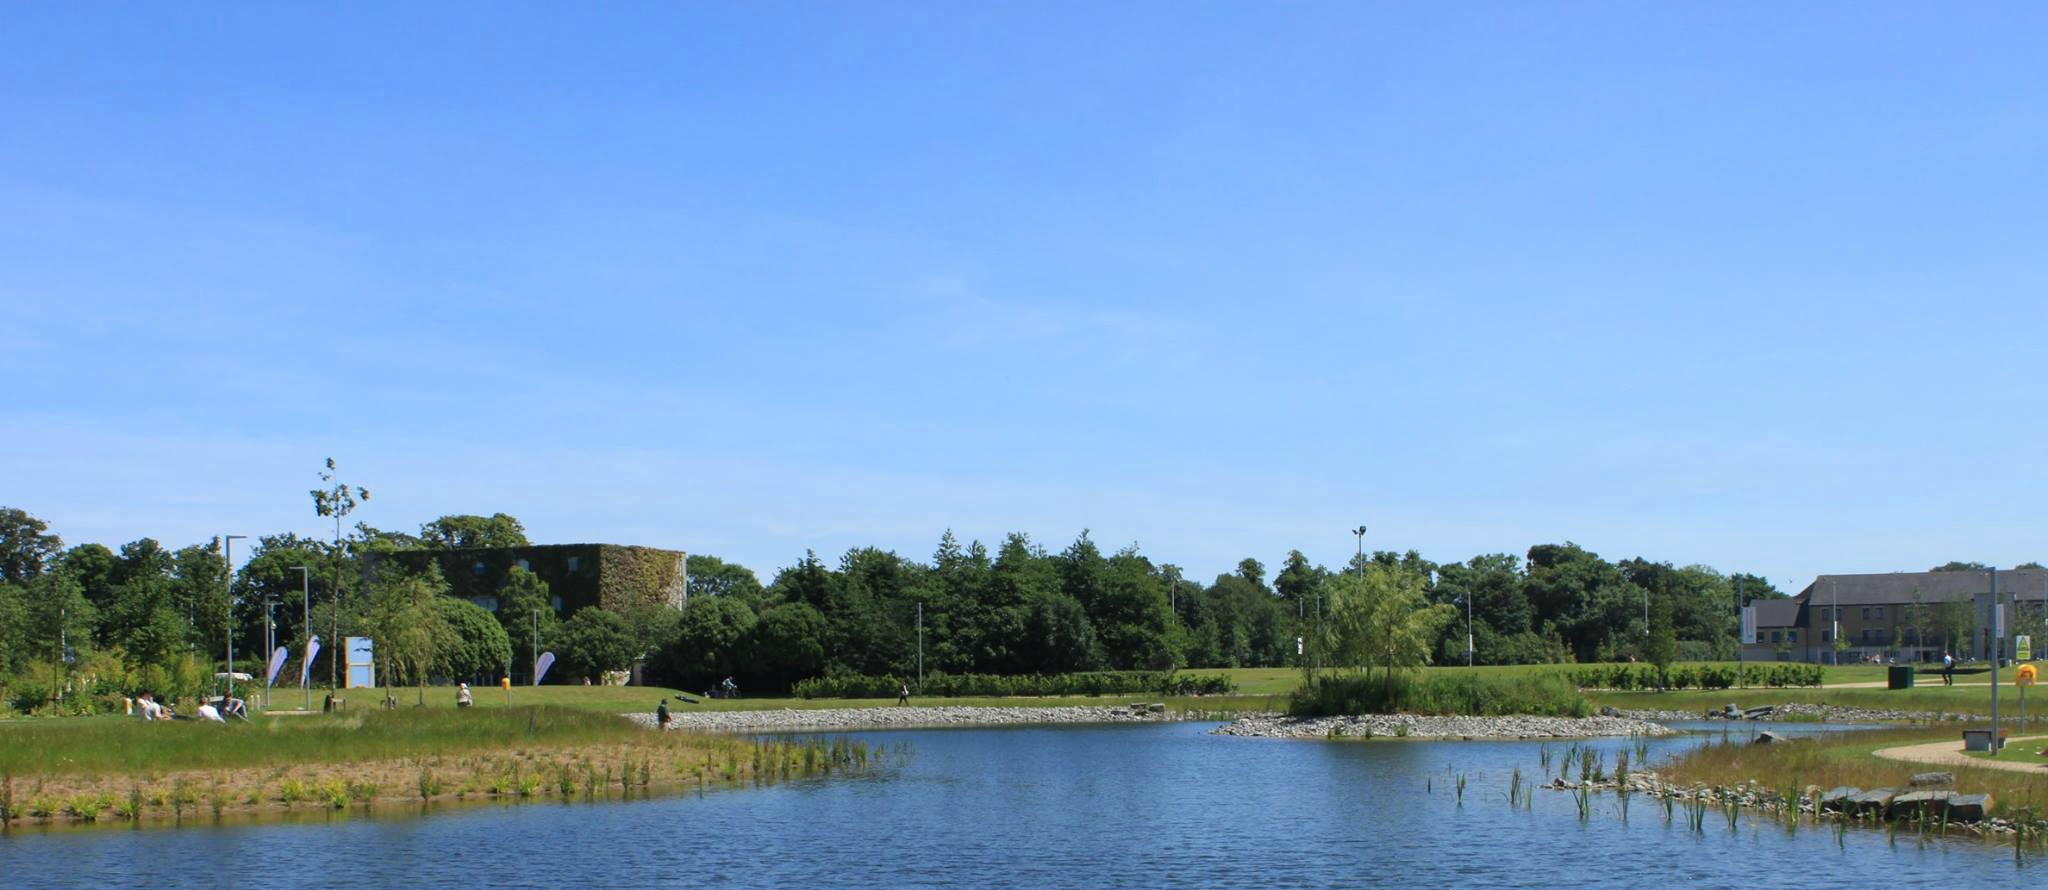 Woodland walks and lakes